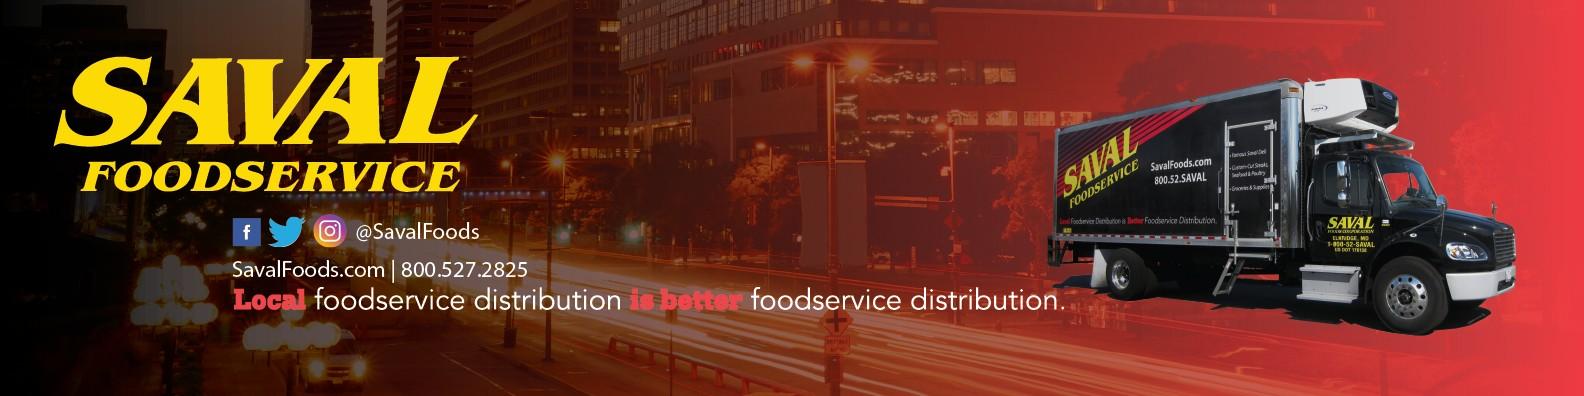 Saval Foodservice | LinkedIn